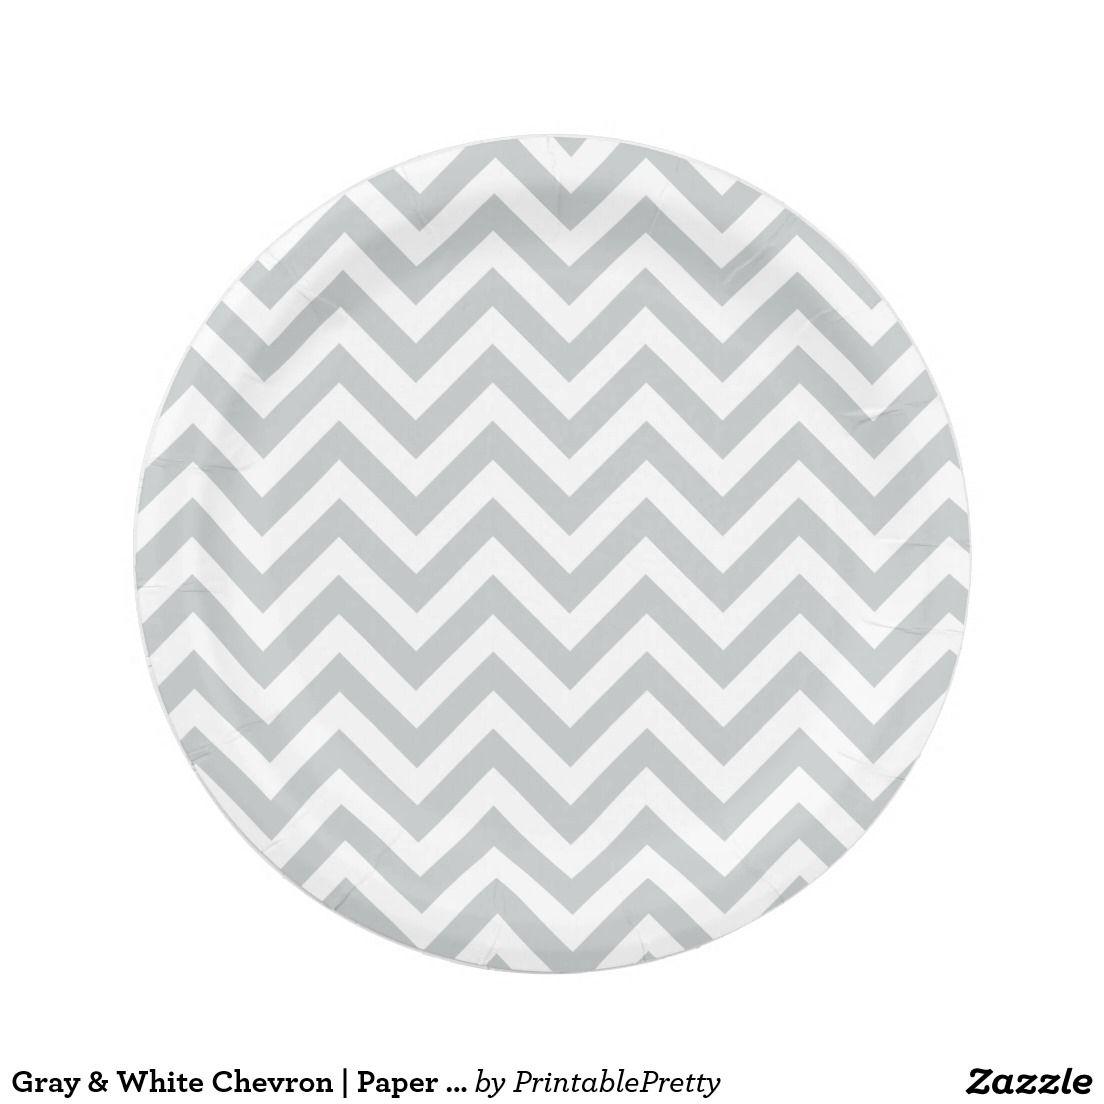 Gray u0026 White Chevron | Paper Plates | Custom Party PAPER PLATES ... Gray White Chevron Paper Plates Custom Party PAPER PLATES  sc 1 st  Best Image Engine & Astounding Grey And White Chevron Paper Plates Photos - Best Image ...